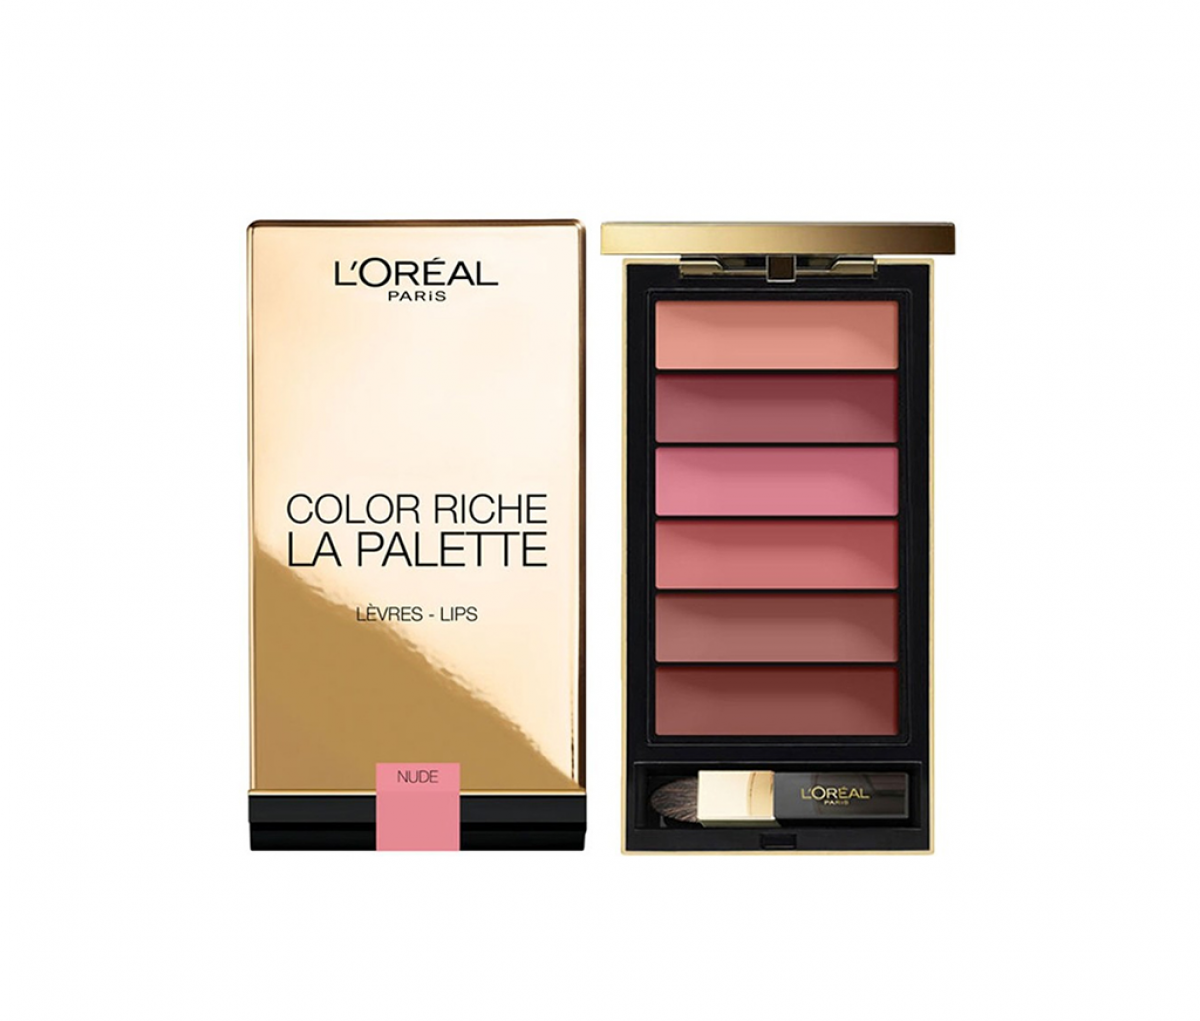 L'Oreal Color Riche La Palette Lips Matte Nude